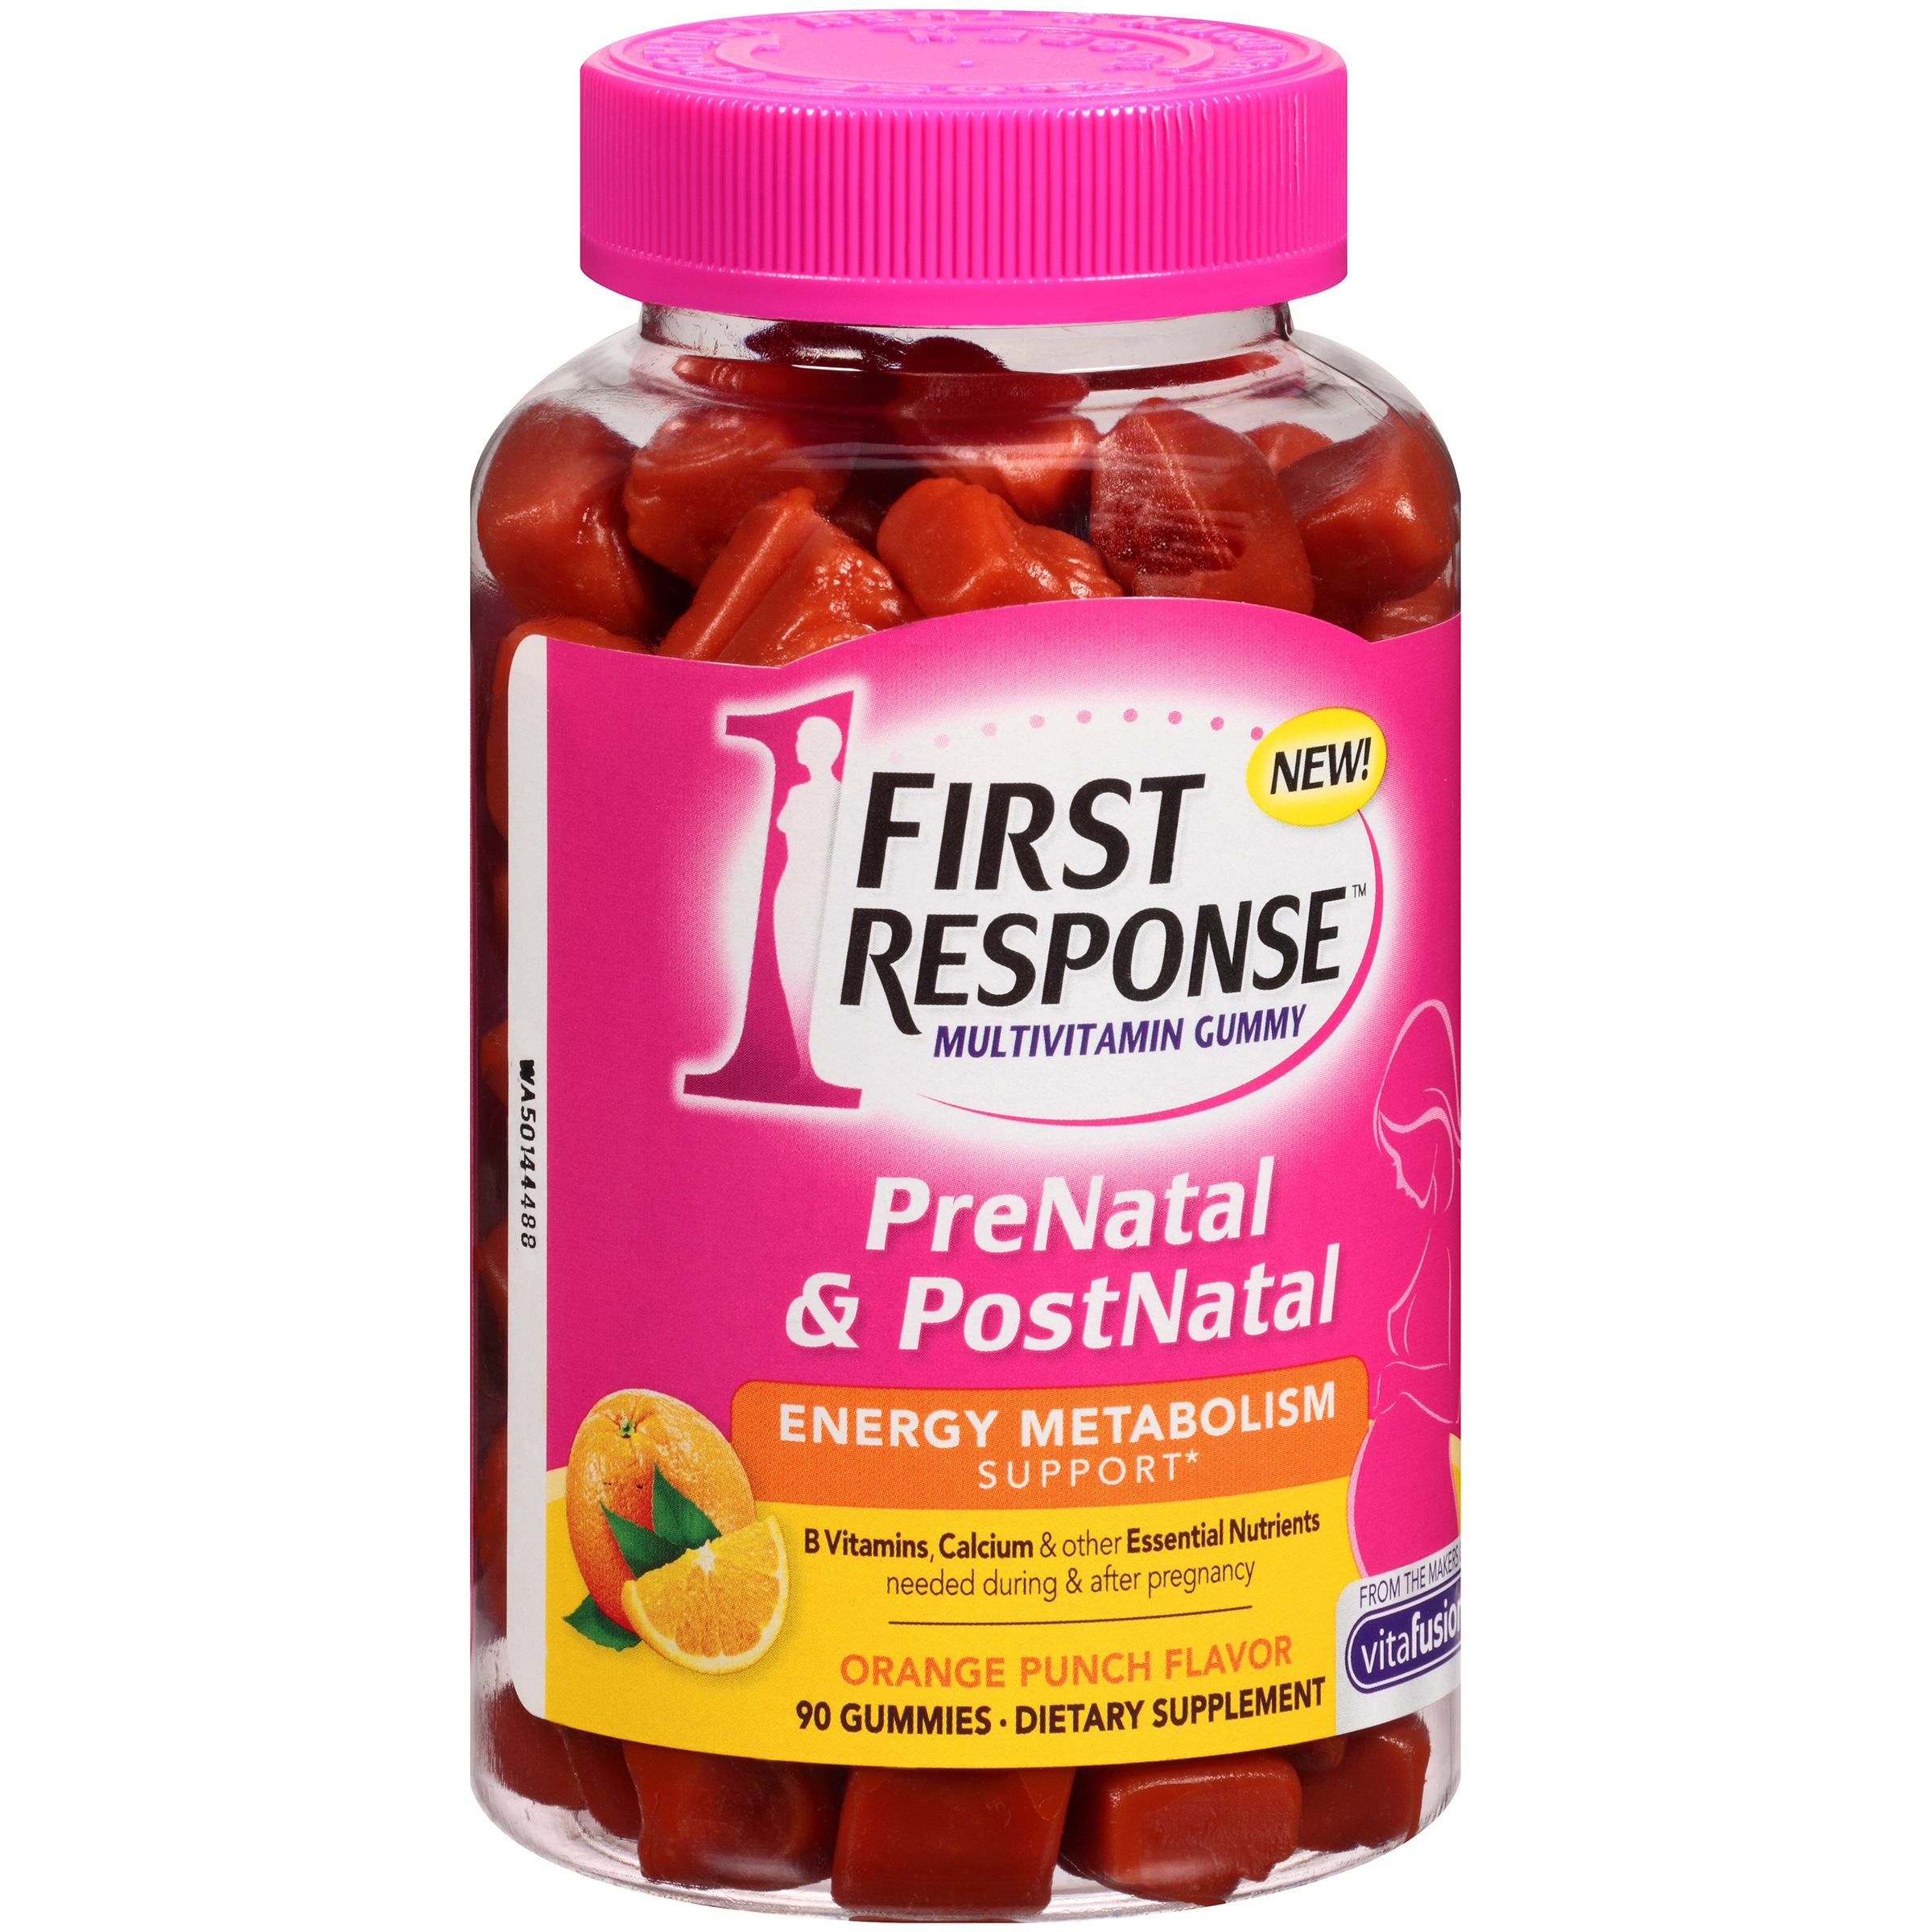 First Response™ PreNatal & PostNatal Multivitamin Gummies 90 ct. Bottle